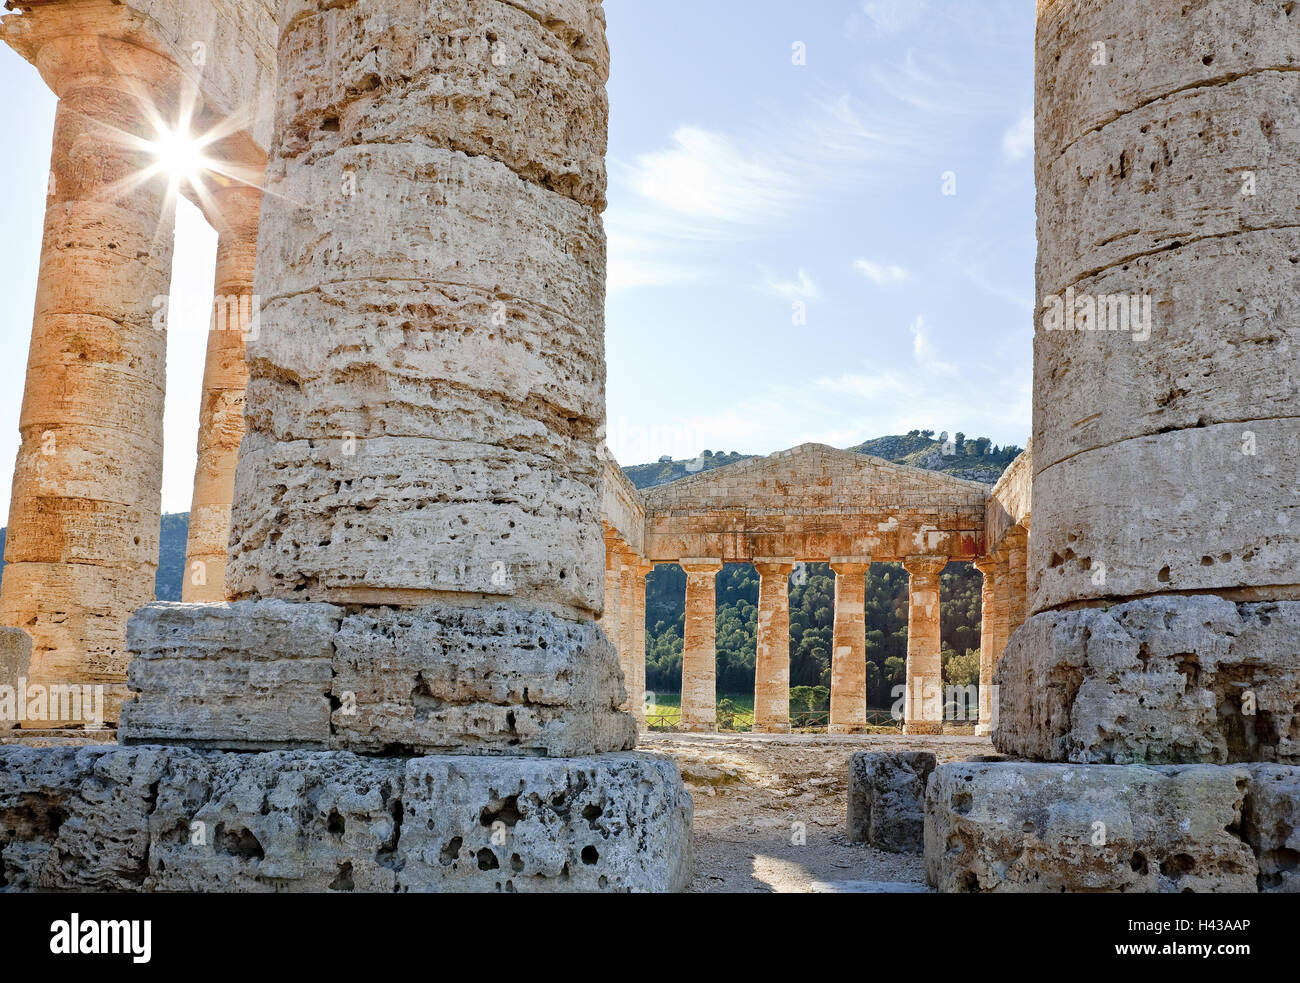 Italien, Insel Sizilien Segesta, Tempel, Detail, Gegenlicht, Stockbild